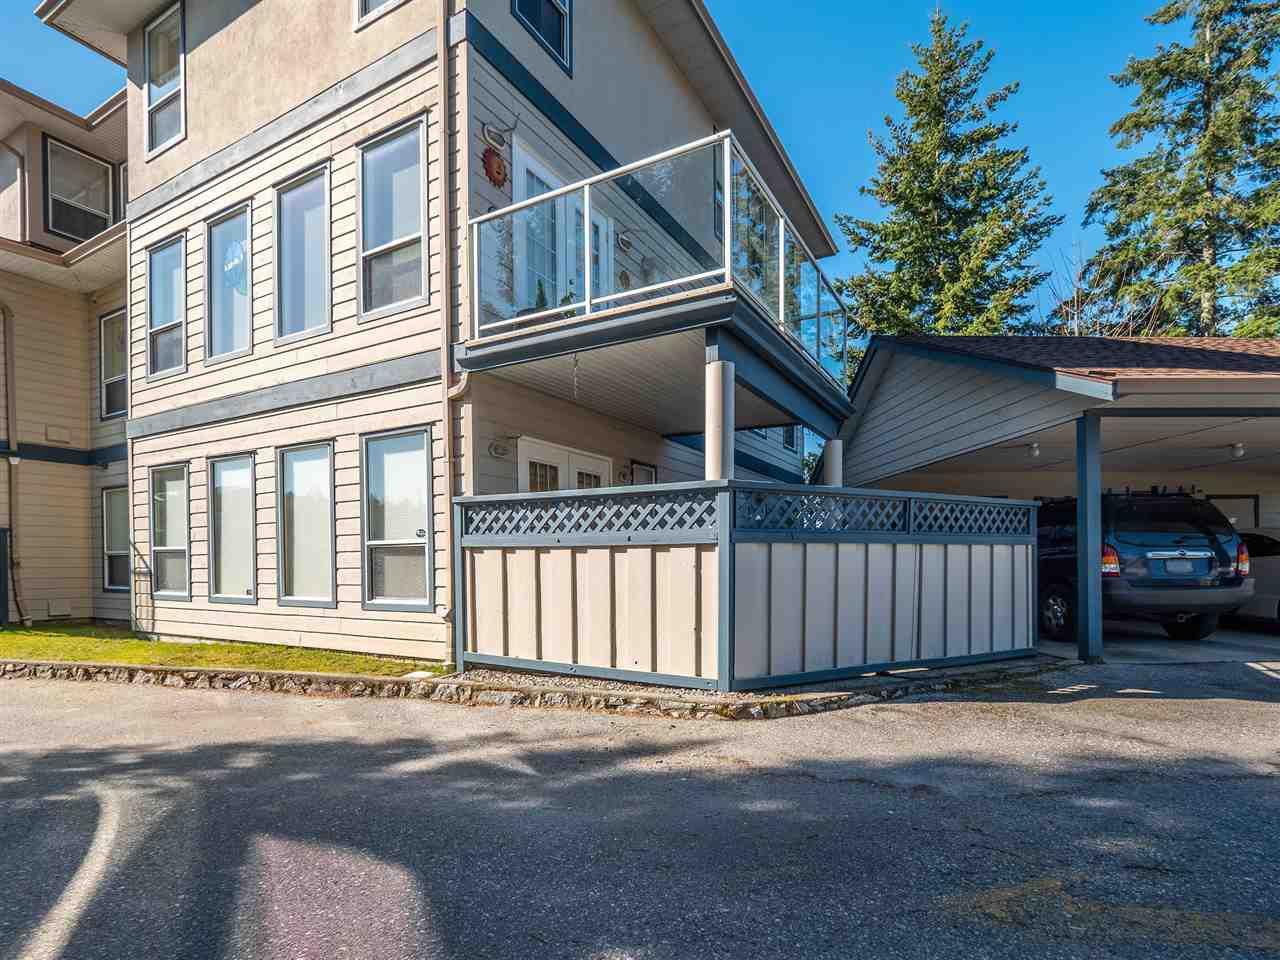 "Main Photo: 105 5768 MARINE Way in Sechelt: Sechelt District Condo for sale in ""Cypress Ridge"" (Sunshine Coast)  : MLS®# R2446337"